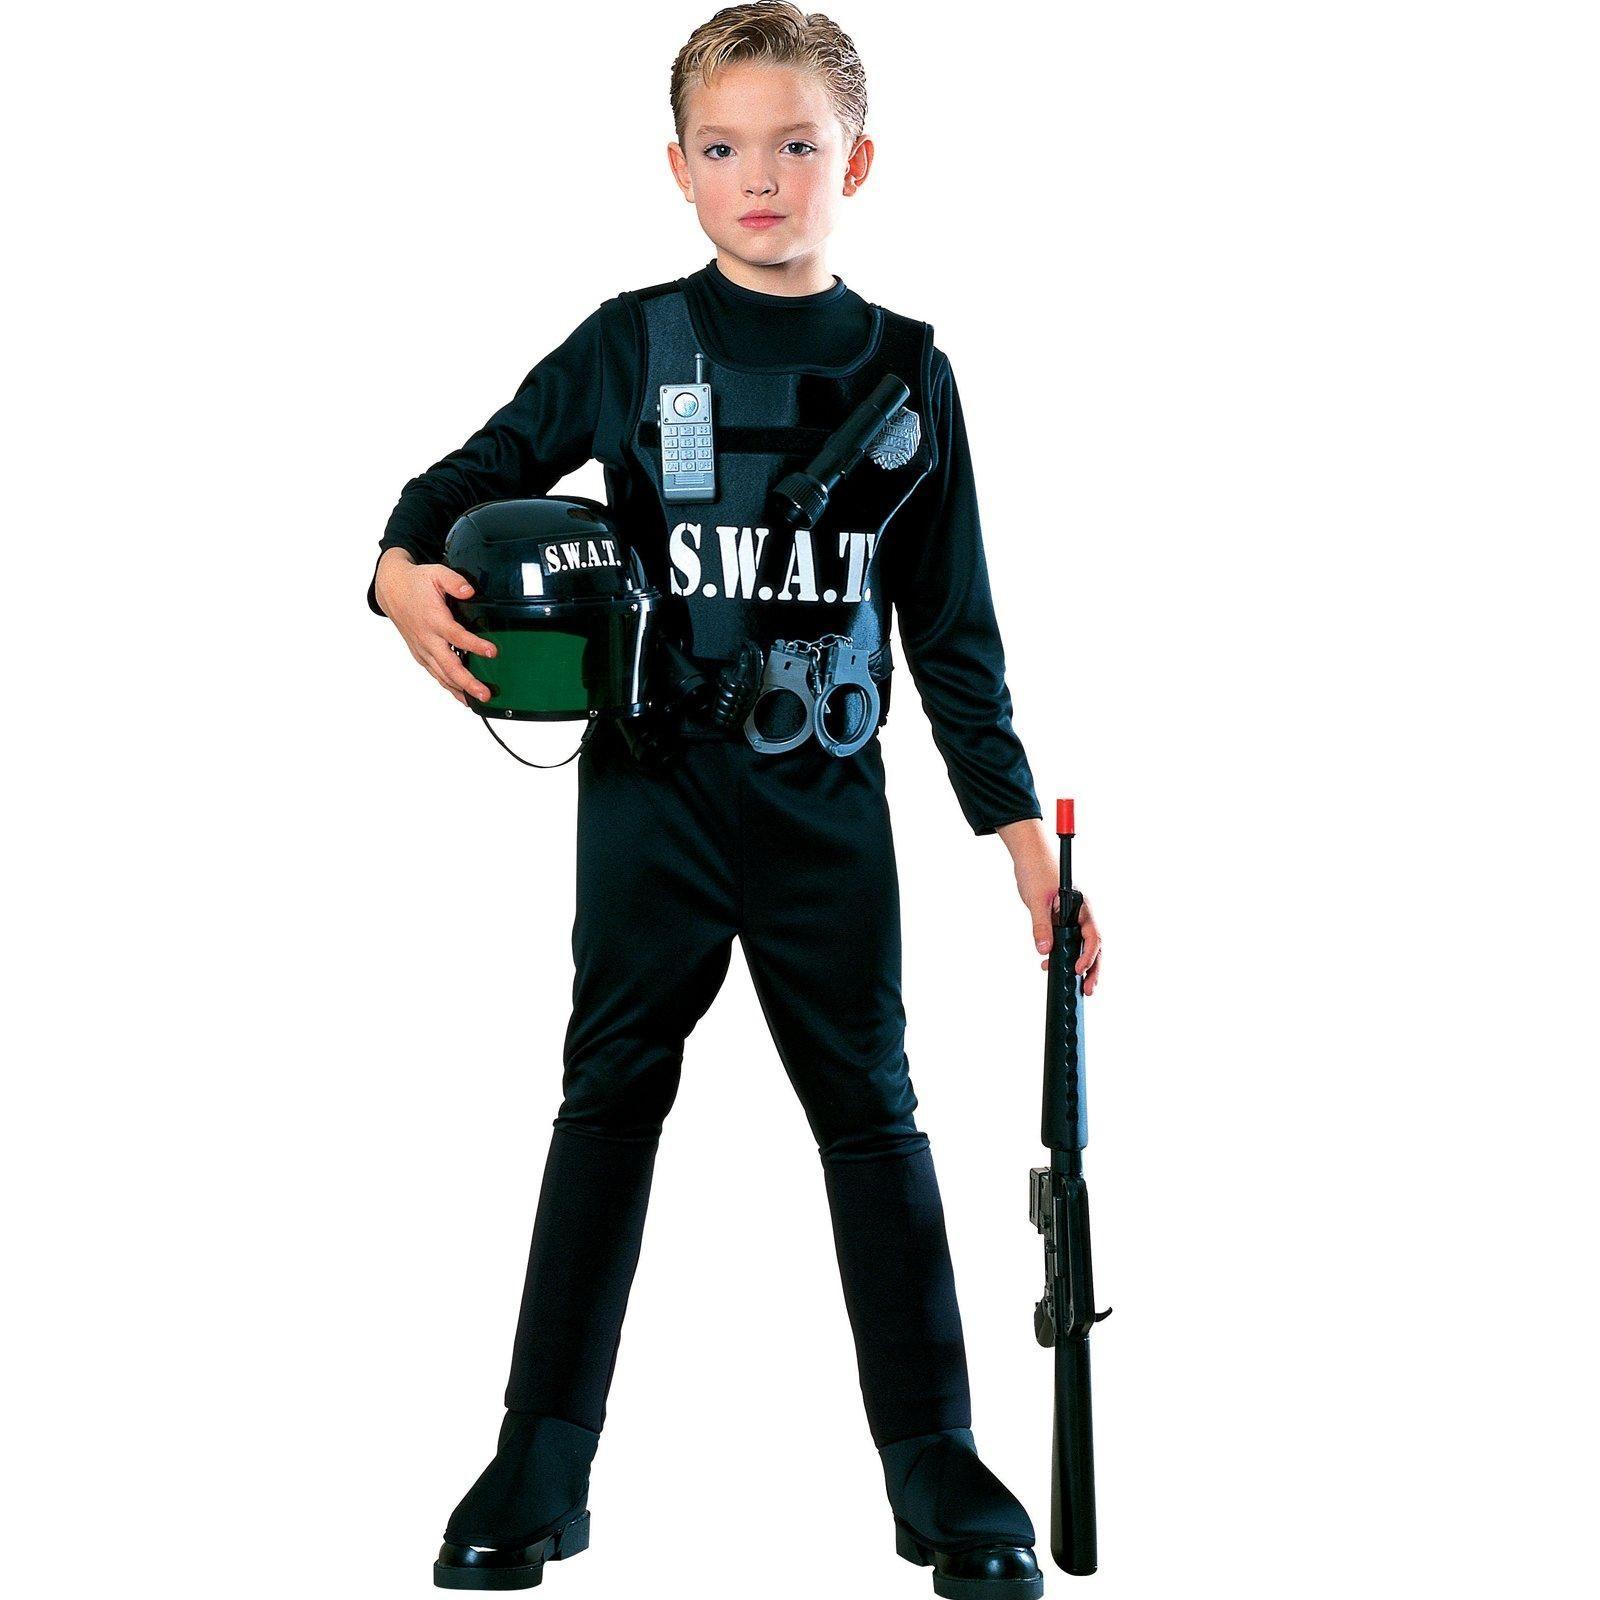 S.W.A.T. Team Child Costume | Halloween costumes | Pinterest ...